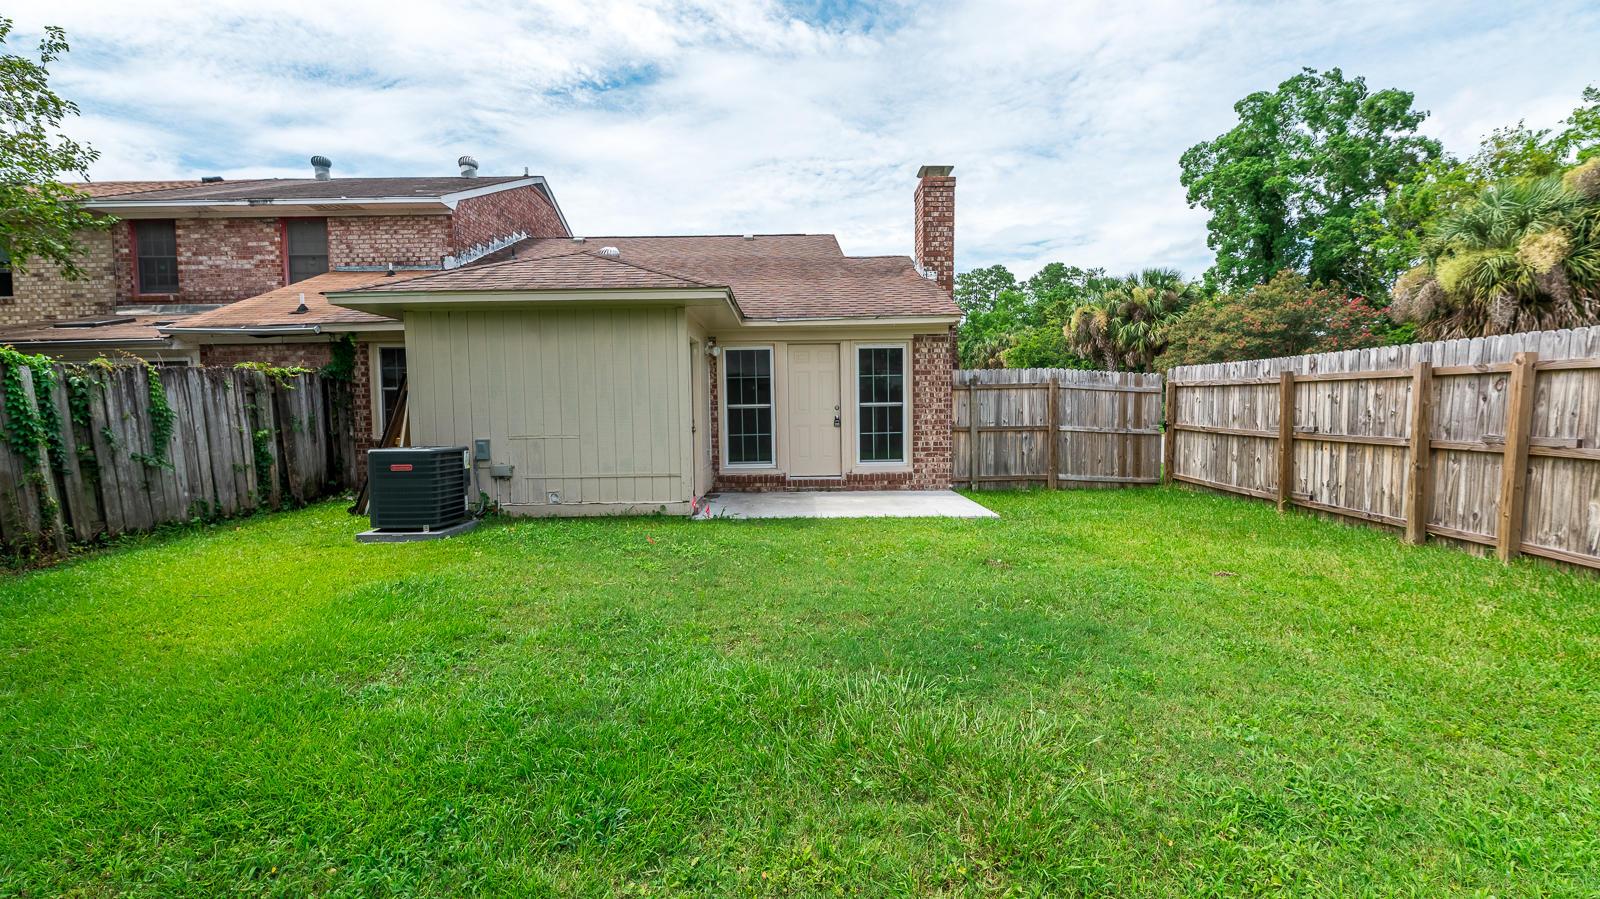 Ashley Villas Homes For Sale - 4315 Briarstone, North Charleston, SC - 11